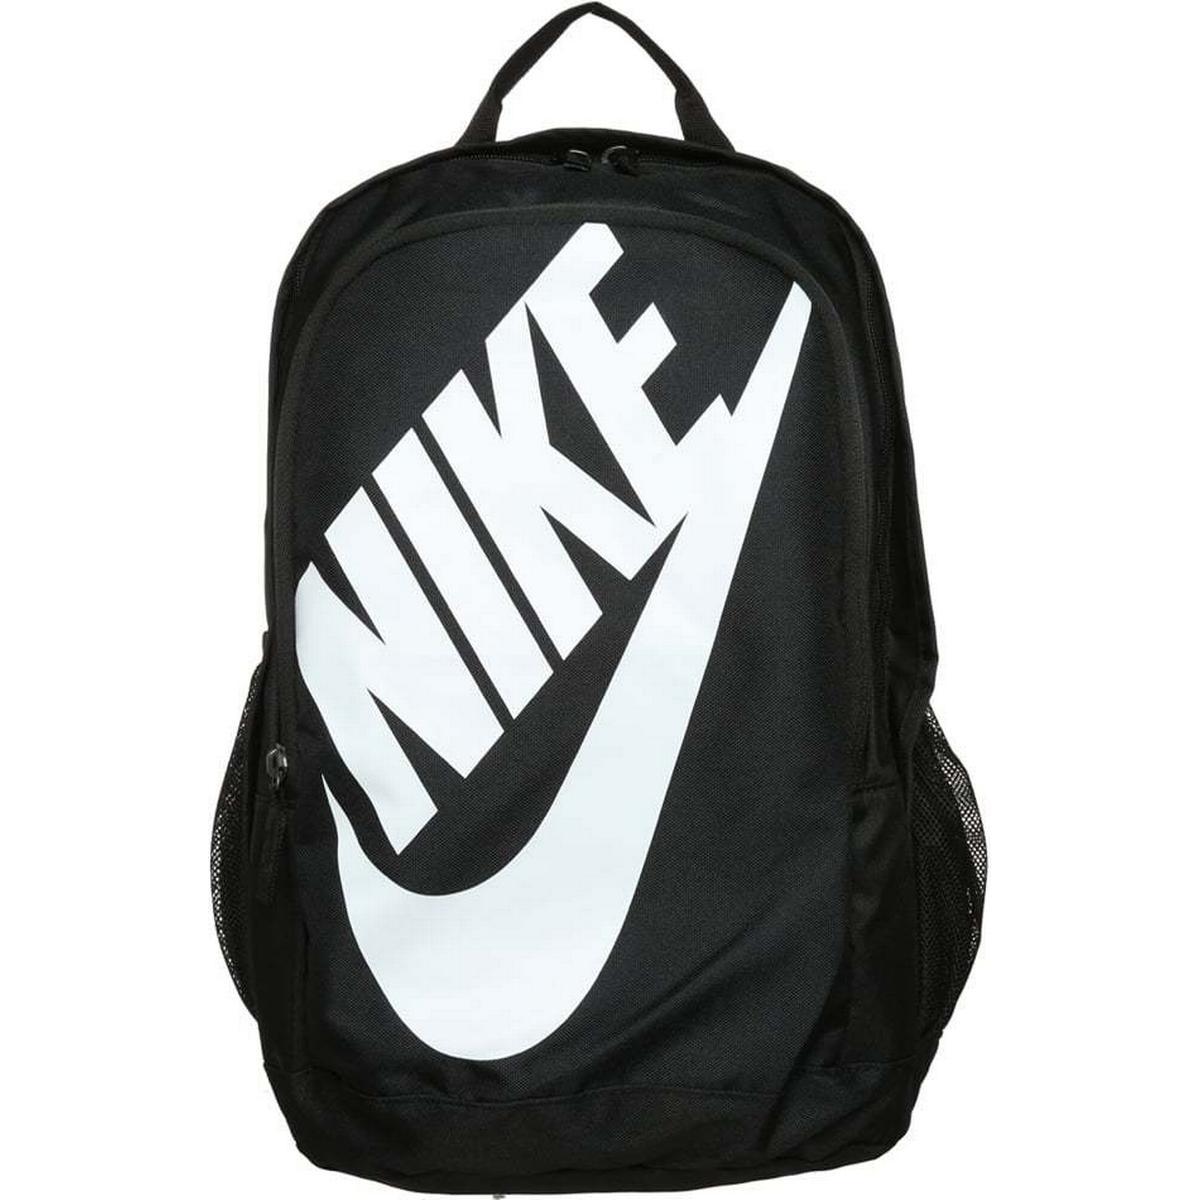 f129a57c802 Nike Sportstaske - Sammenlign priser hos PriceRunner